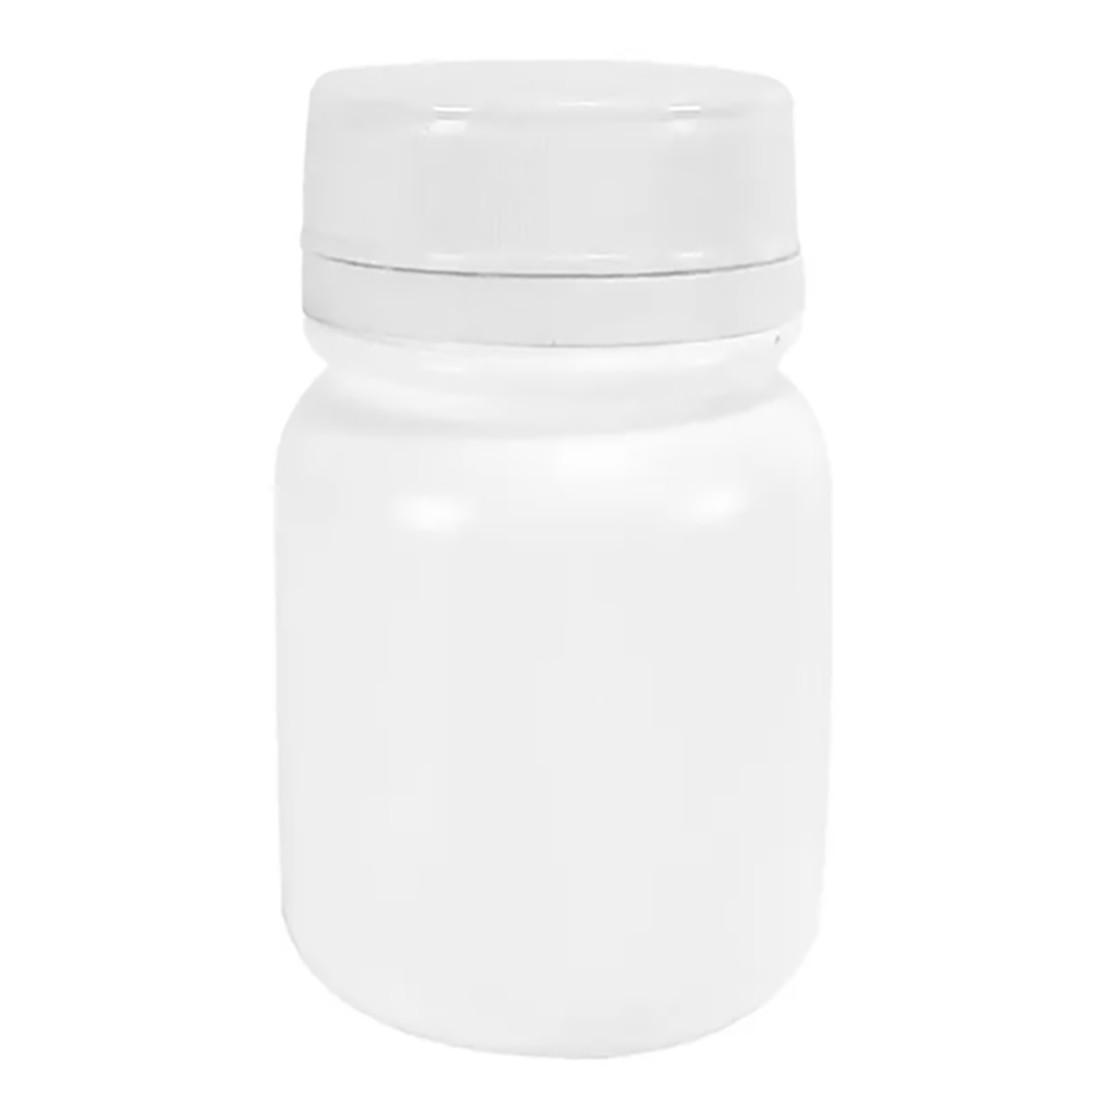 Pote Plástico para cápsula 120 ml Rosca Lacre kit com 50 unid